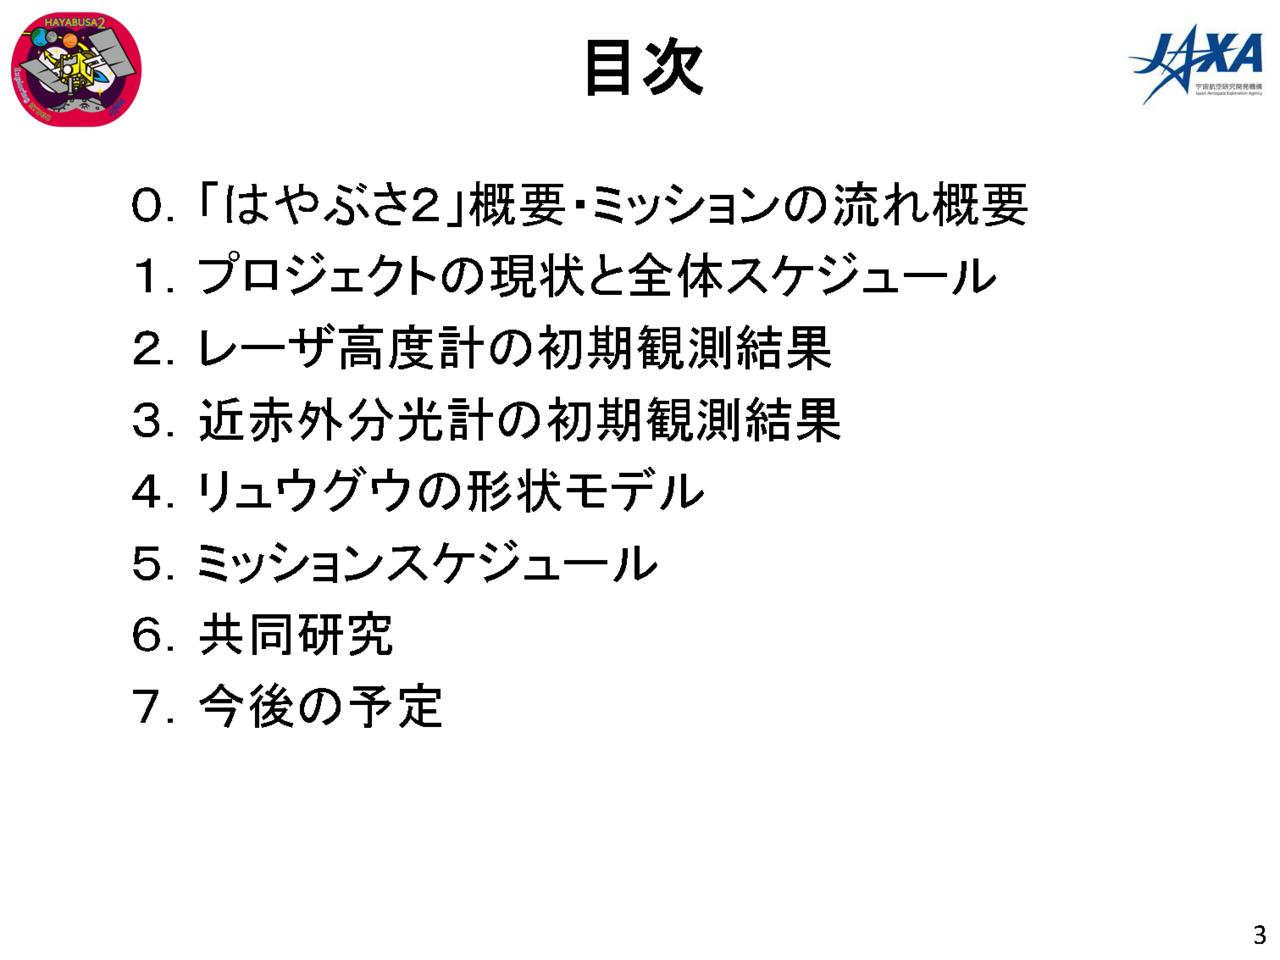 f:id:Imamura:20180802145923p:plain